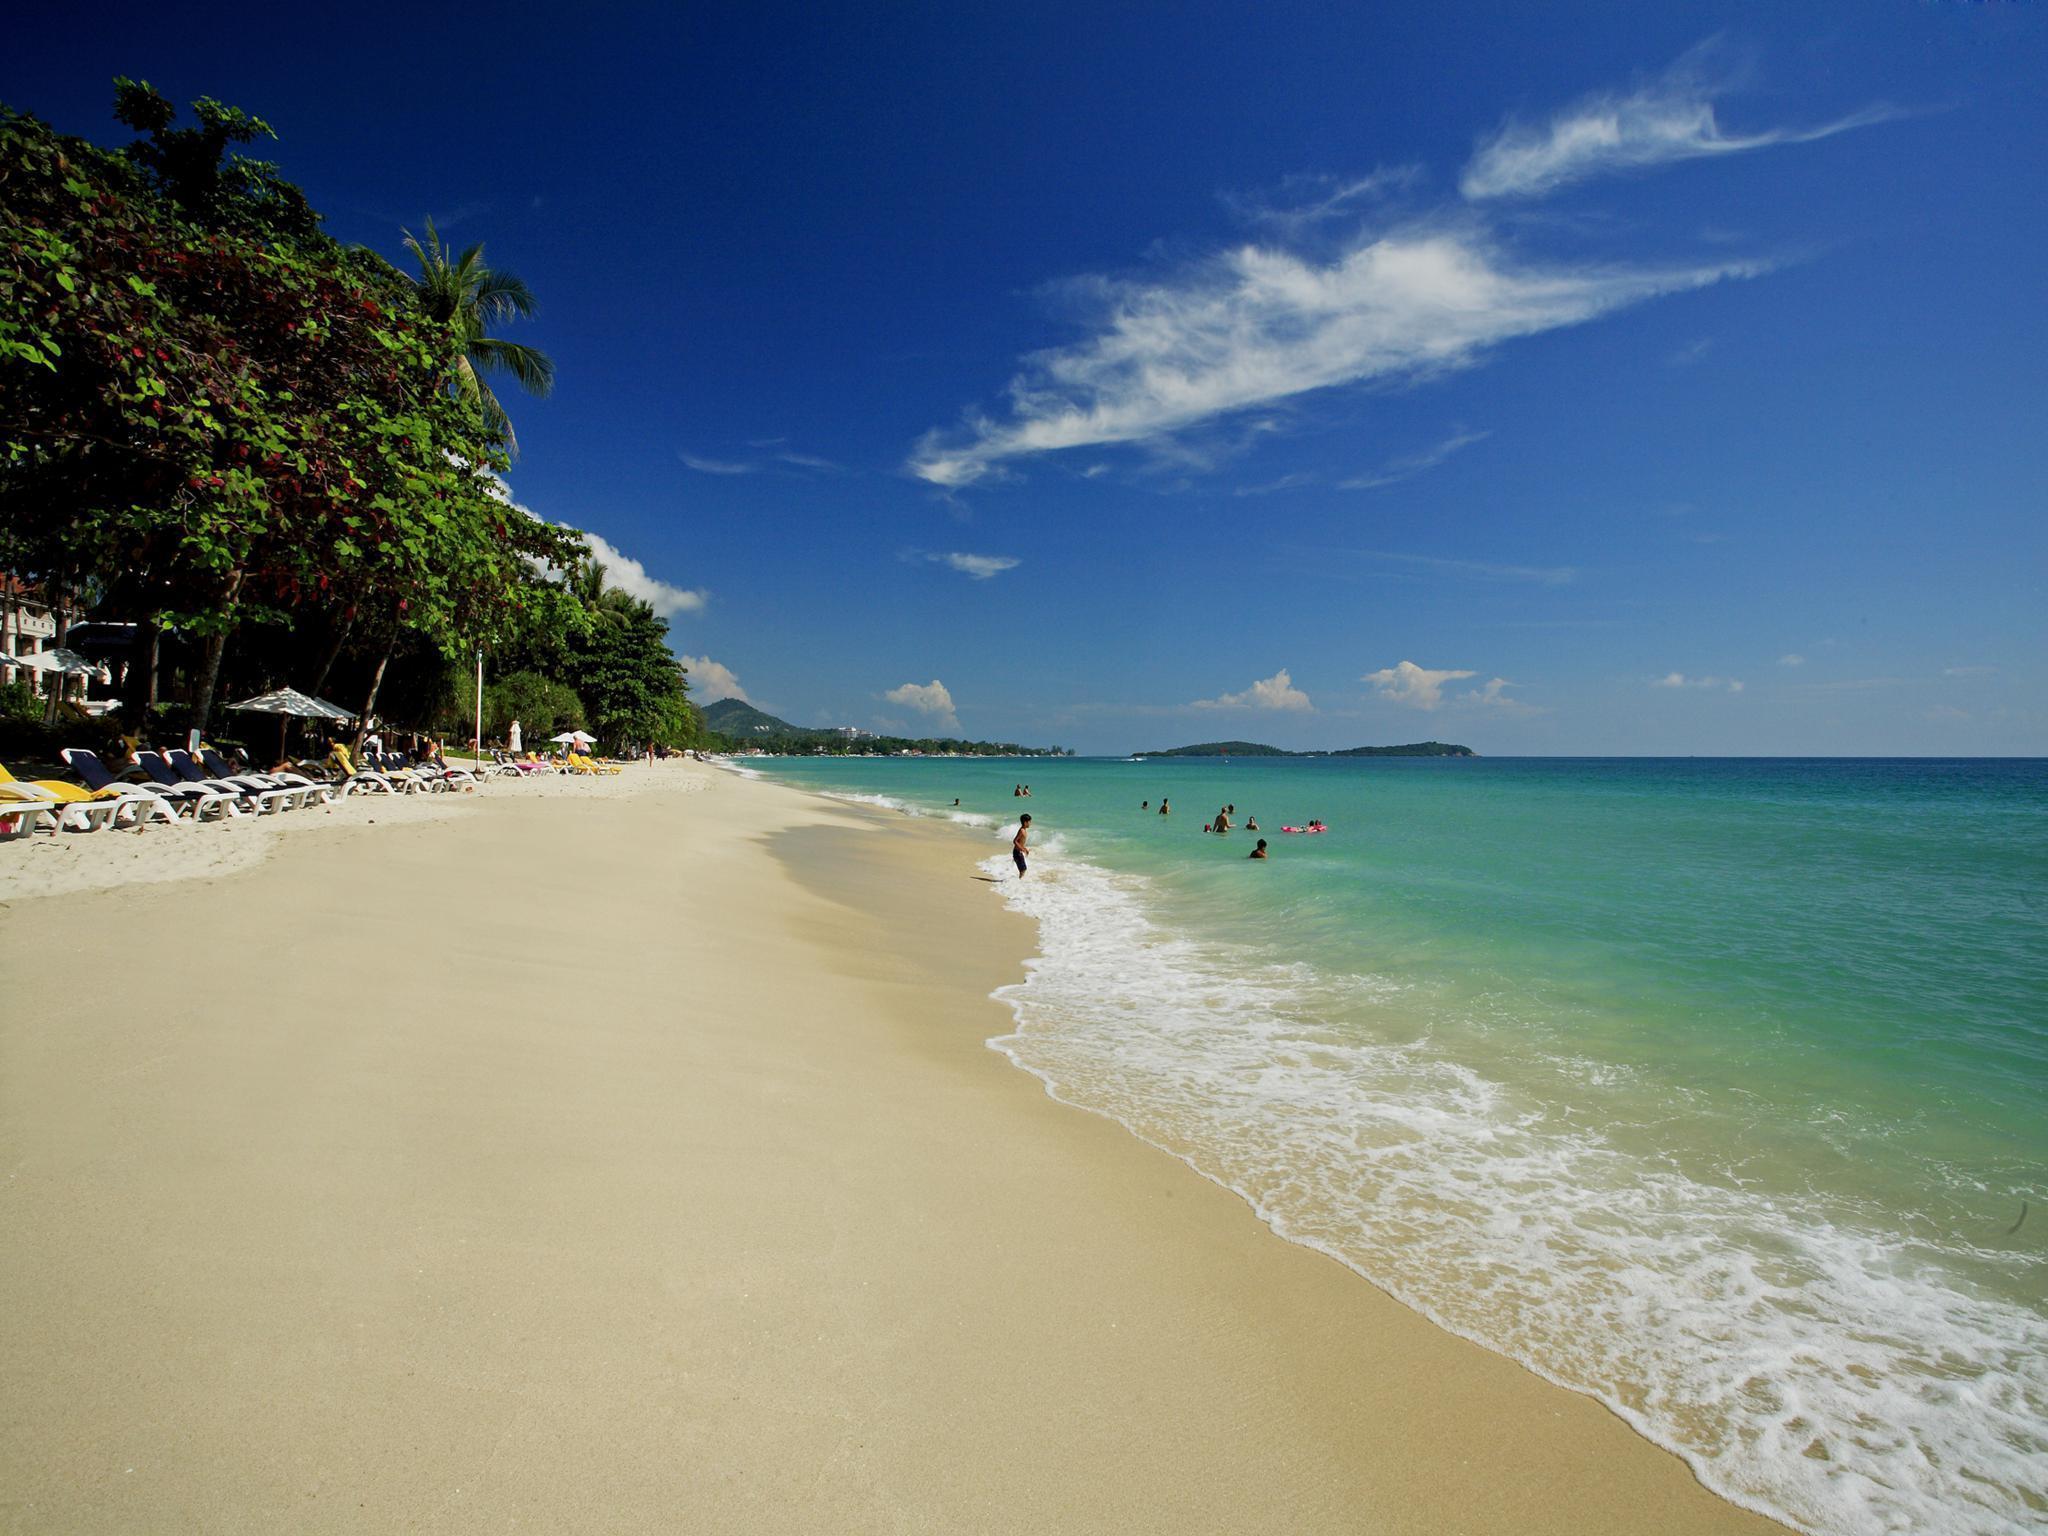 Centara Grand Beach Resort Samui เซนทารา แกรนด์ บีช รีสอร์ท สมุย